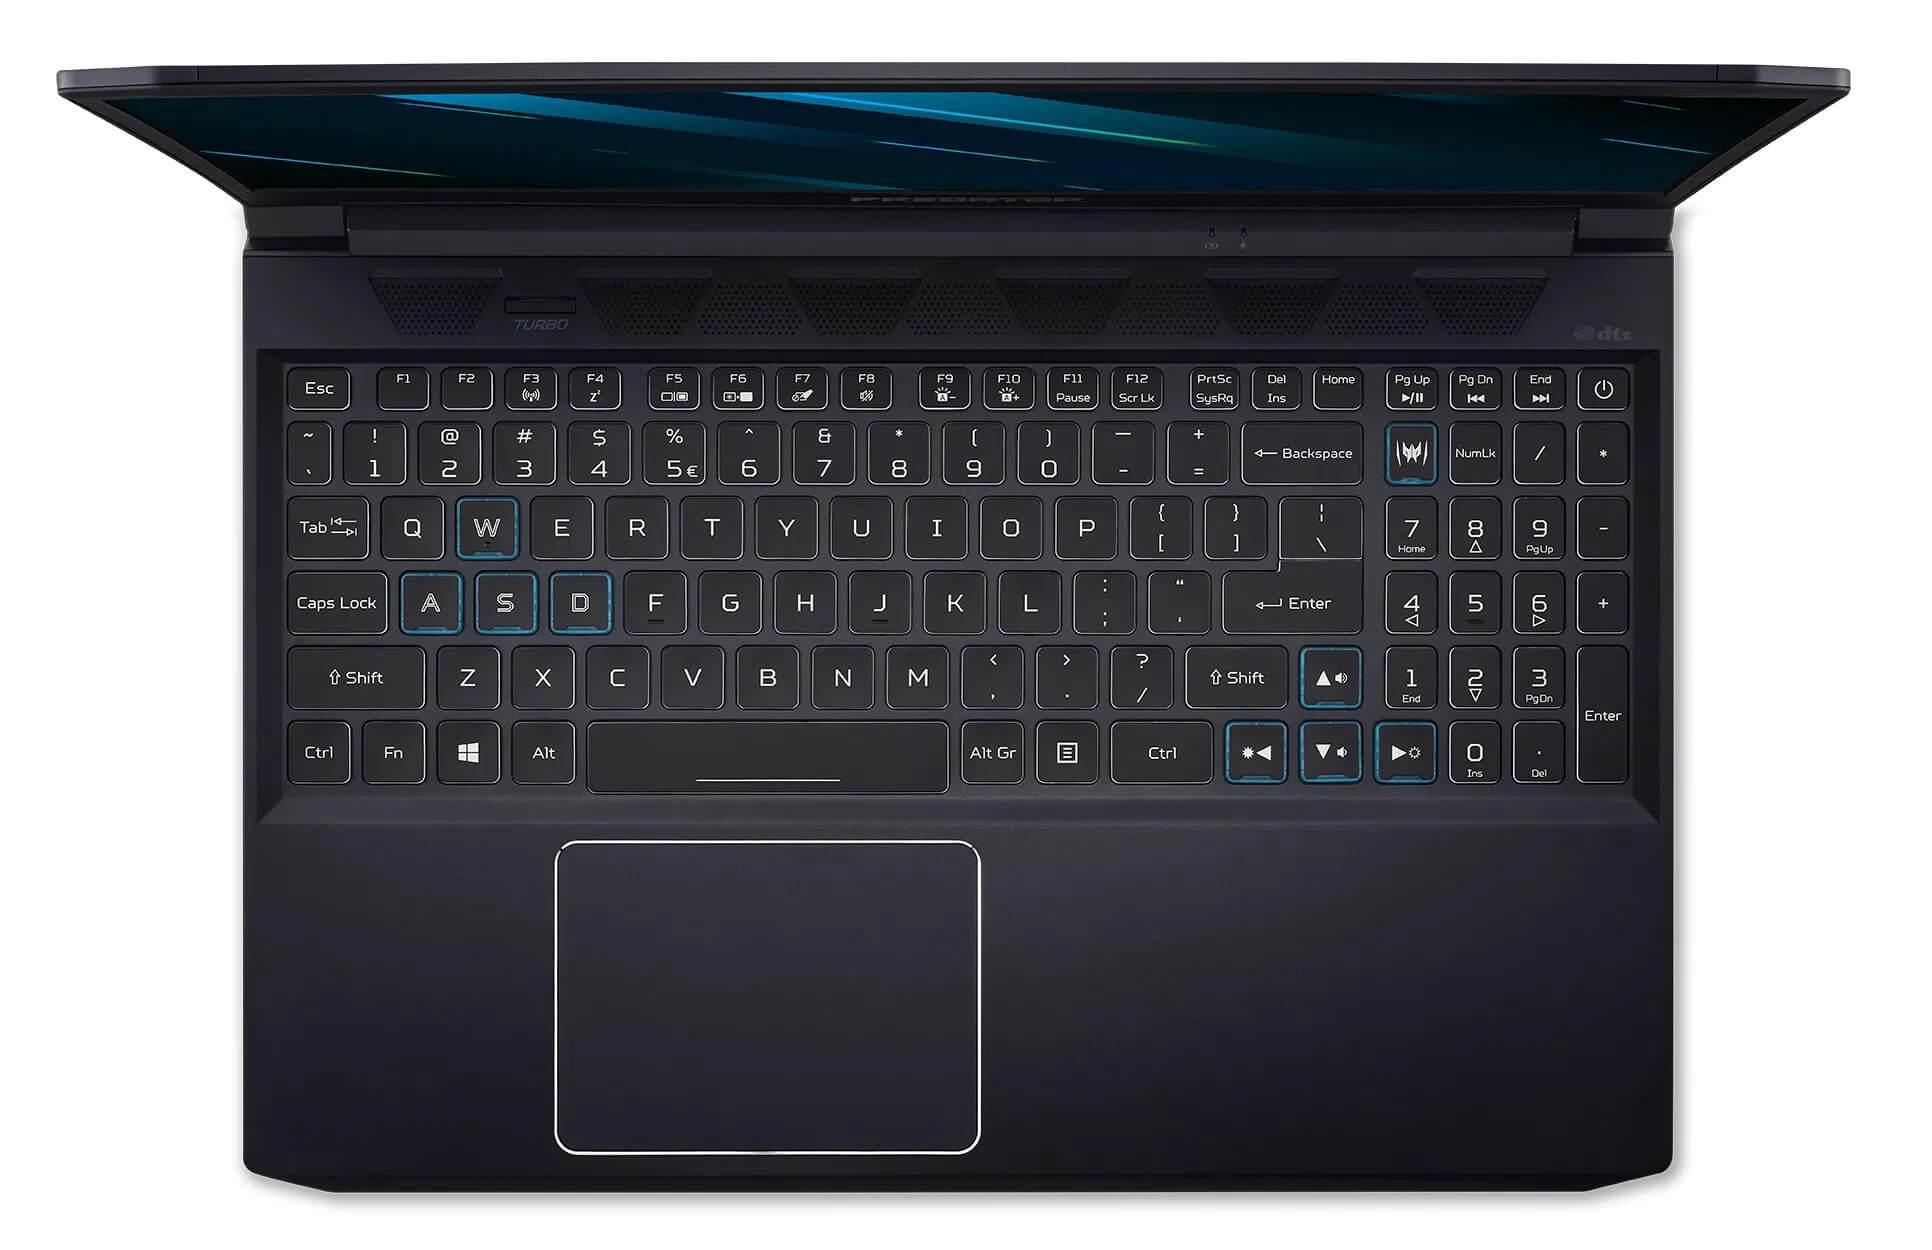 Acer Predator Triton 300 vs helios 300 keyboard